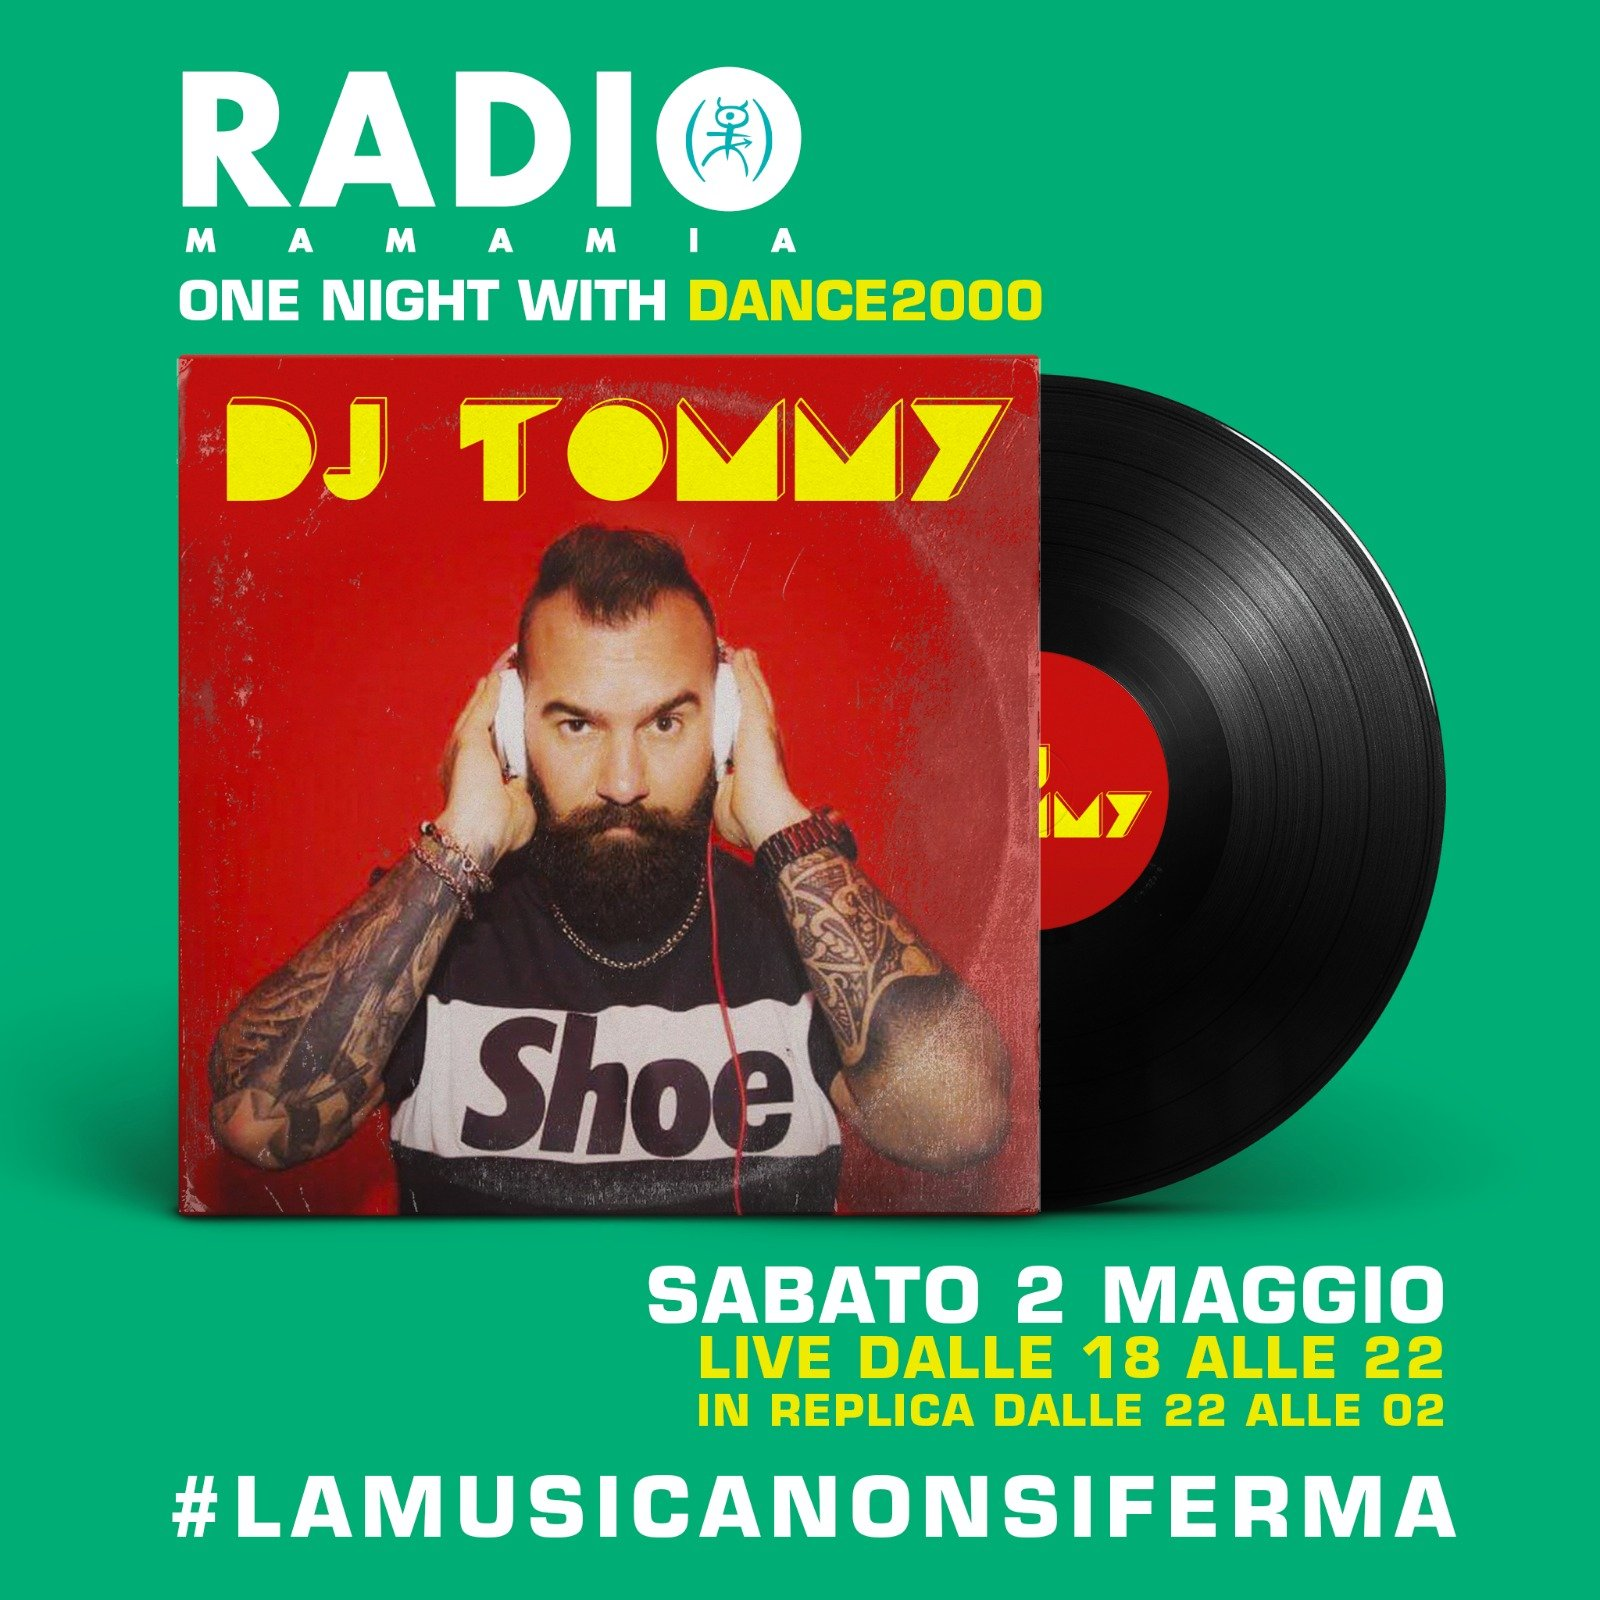 Tommy Dj Radio Mamamia